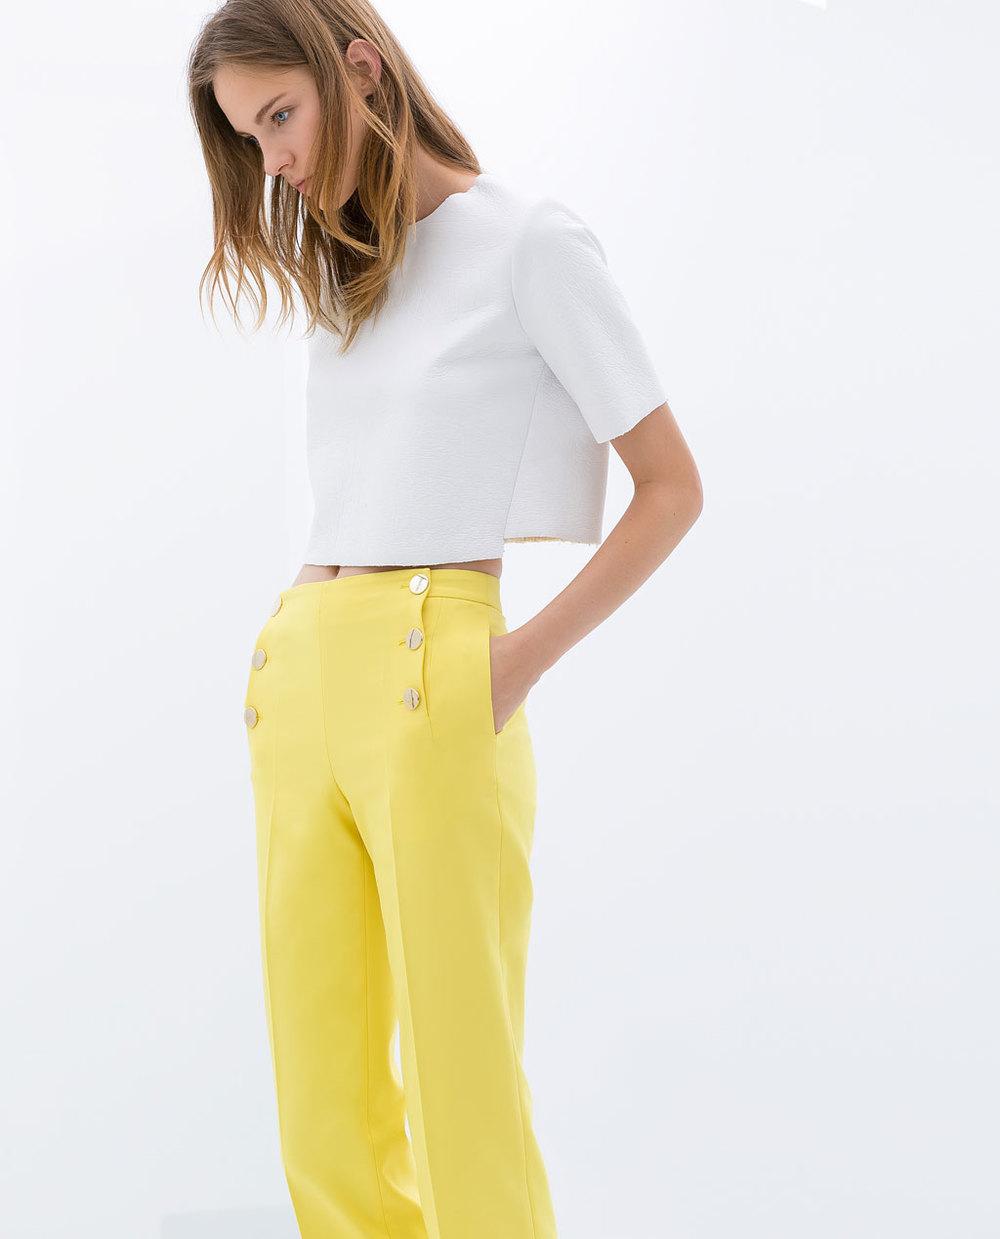 Shiny crop sweater. Zara. $79.90.